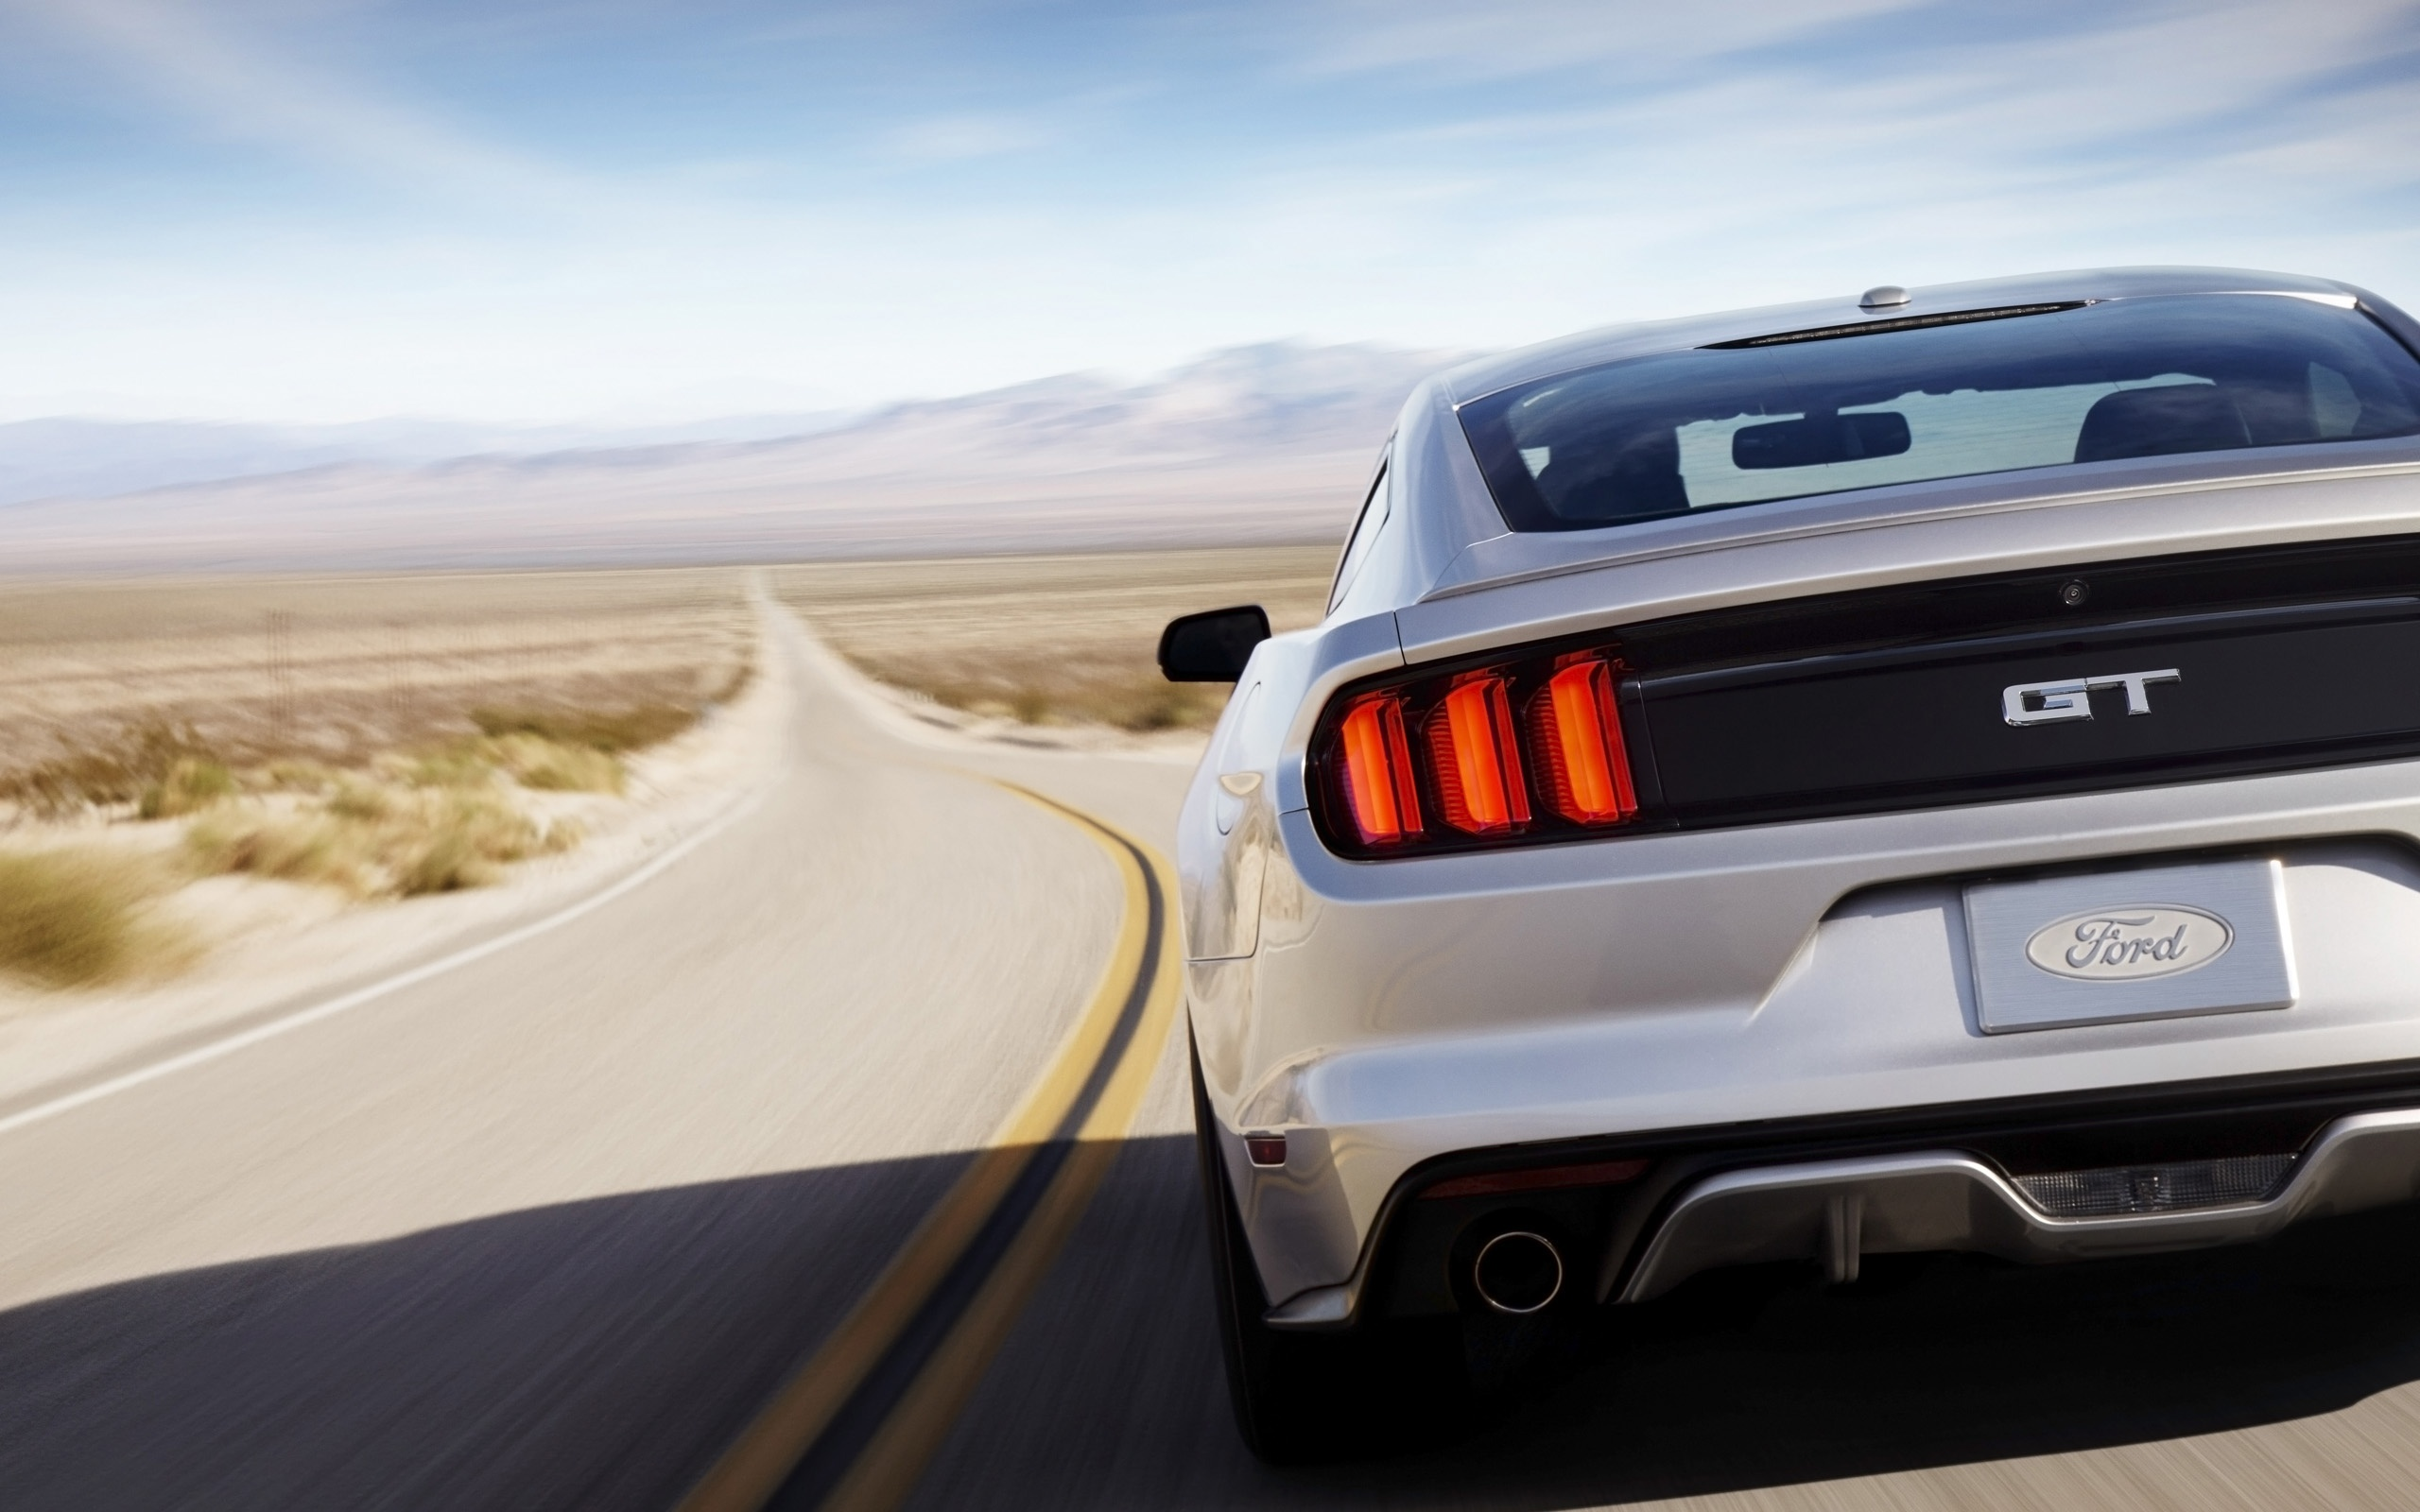 2015 Ford Mustang 5 Wallpaper HD Car Wallpapers 2560x1600